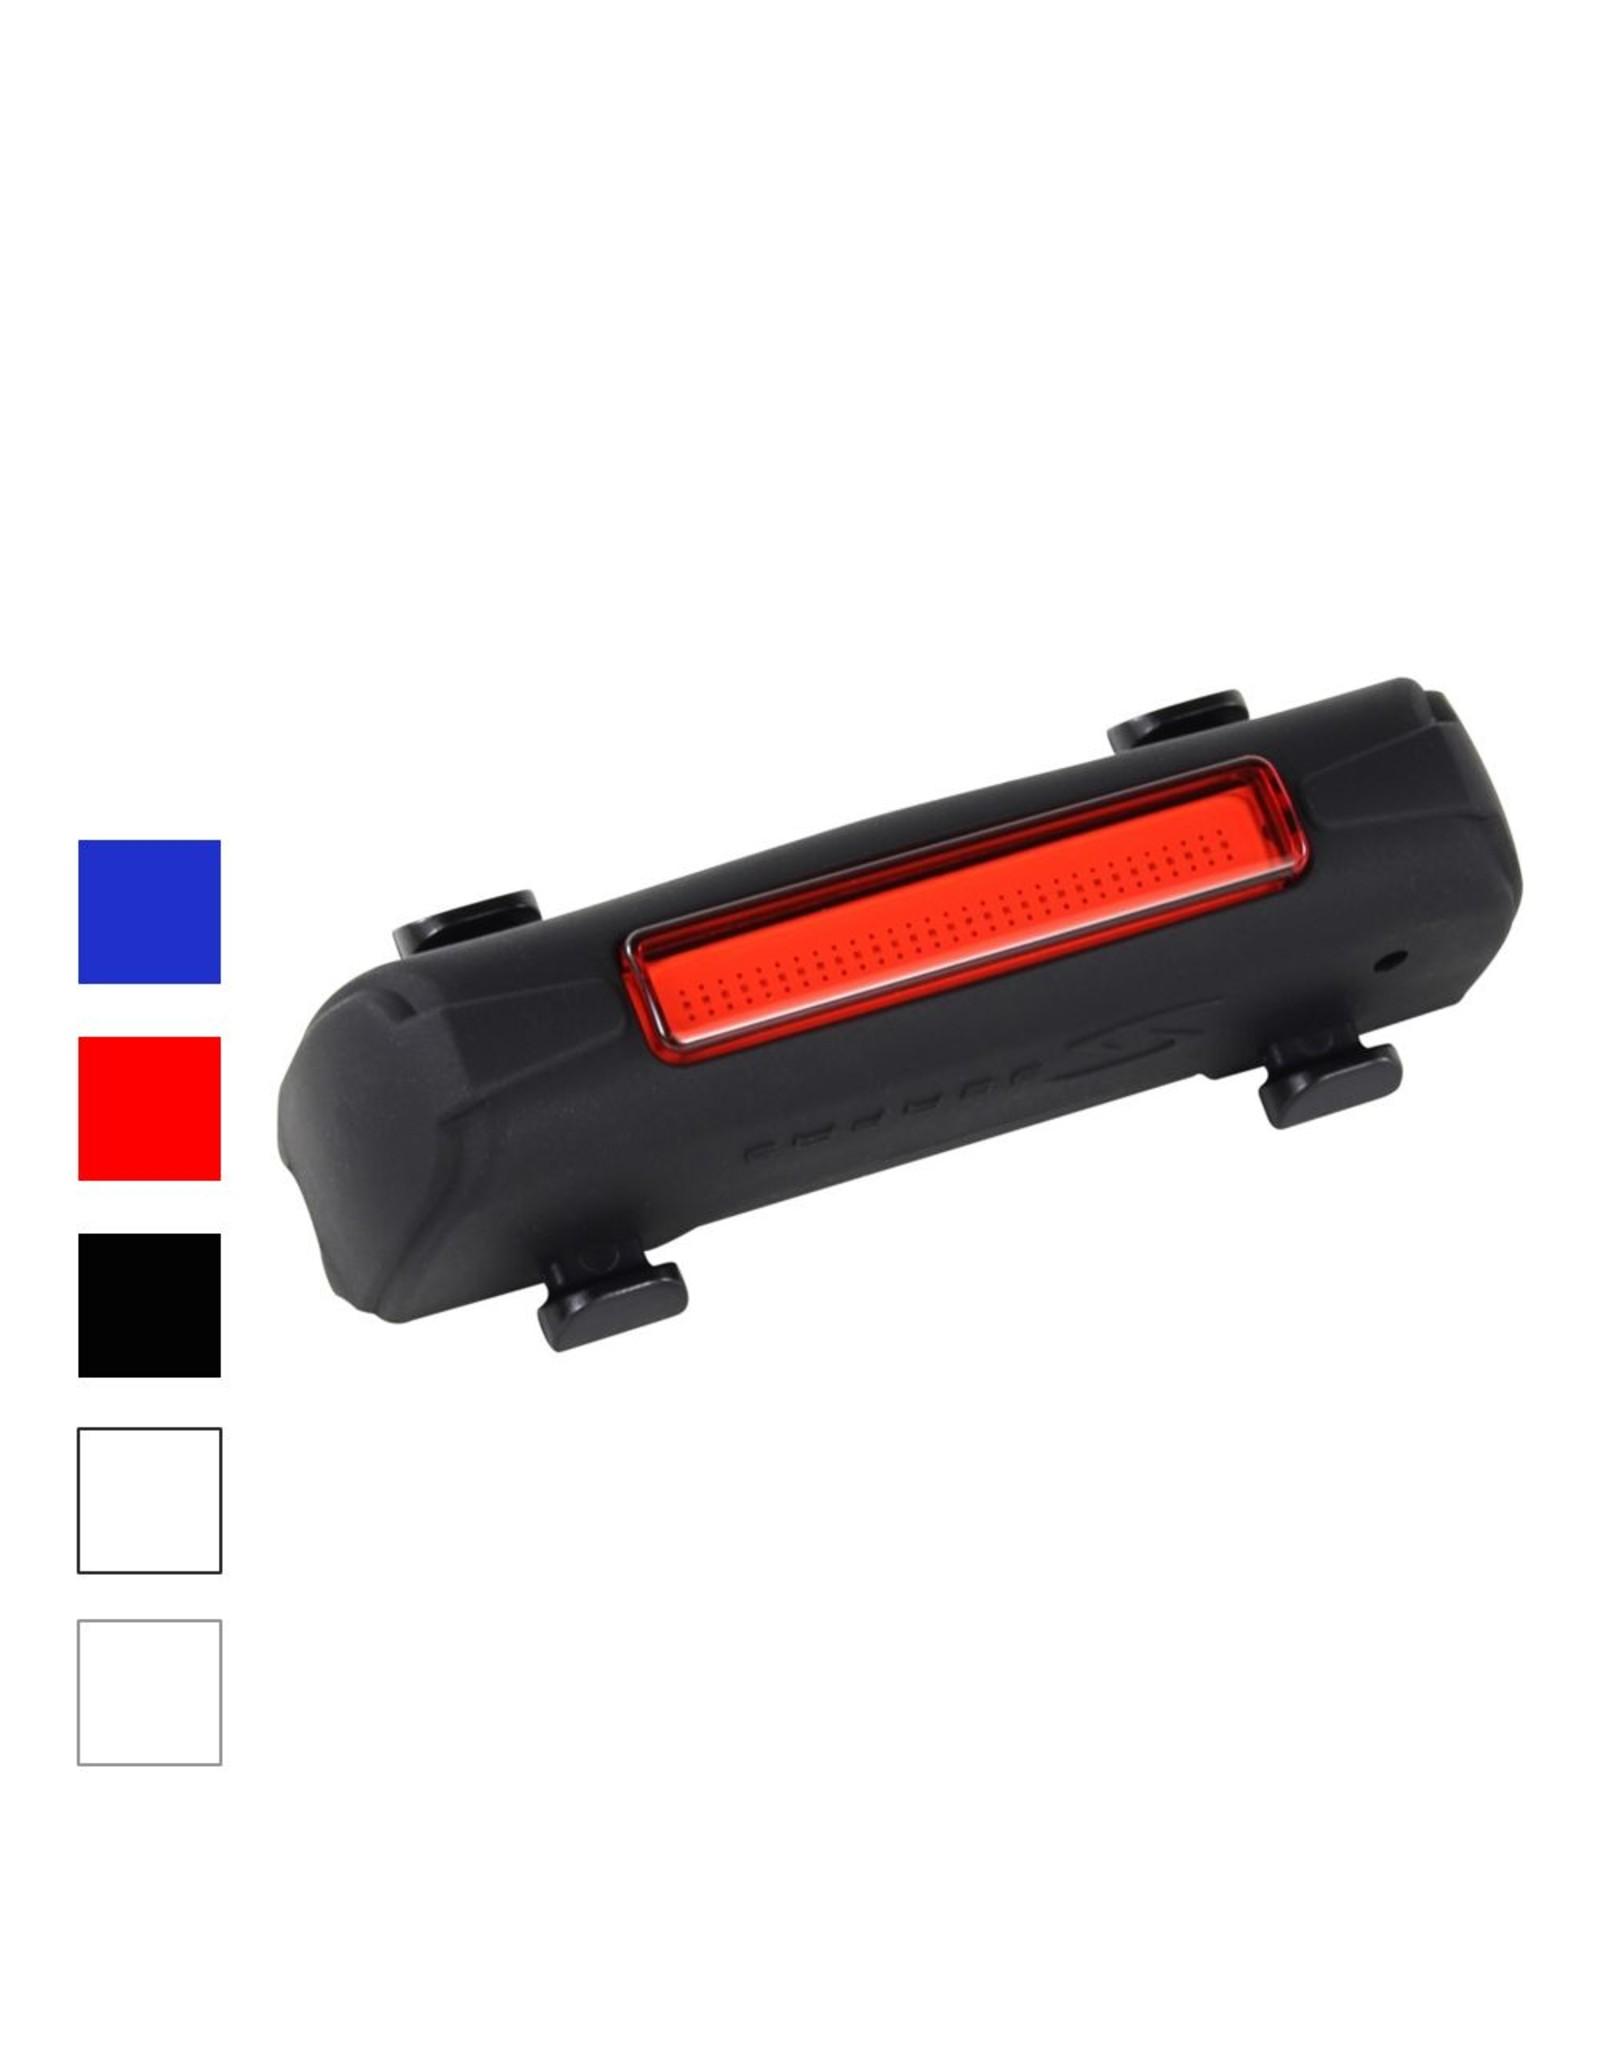 Phare arrière USB Serfas Thunderbolt - USB